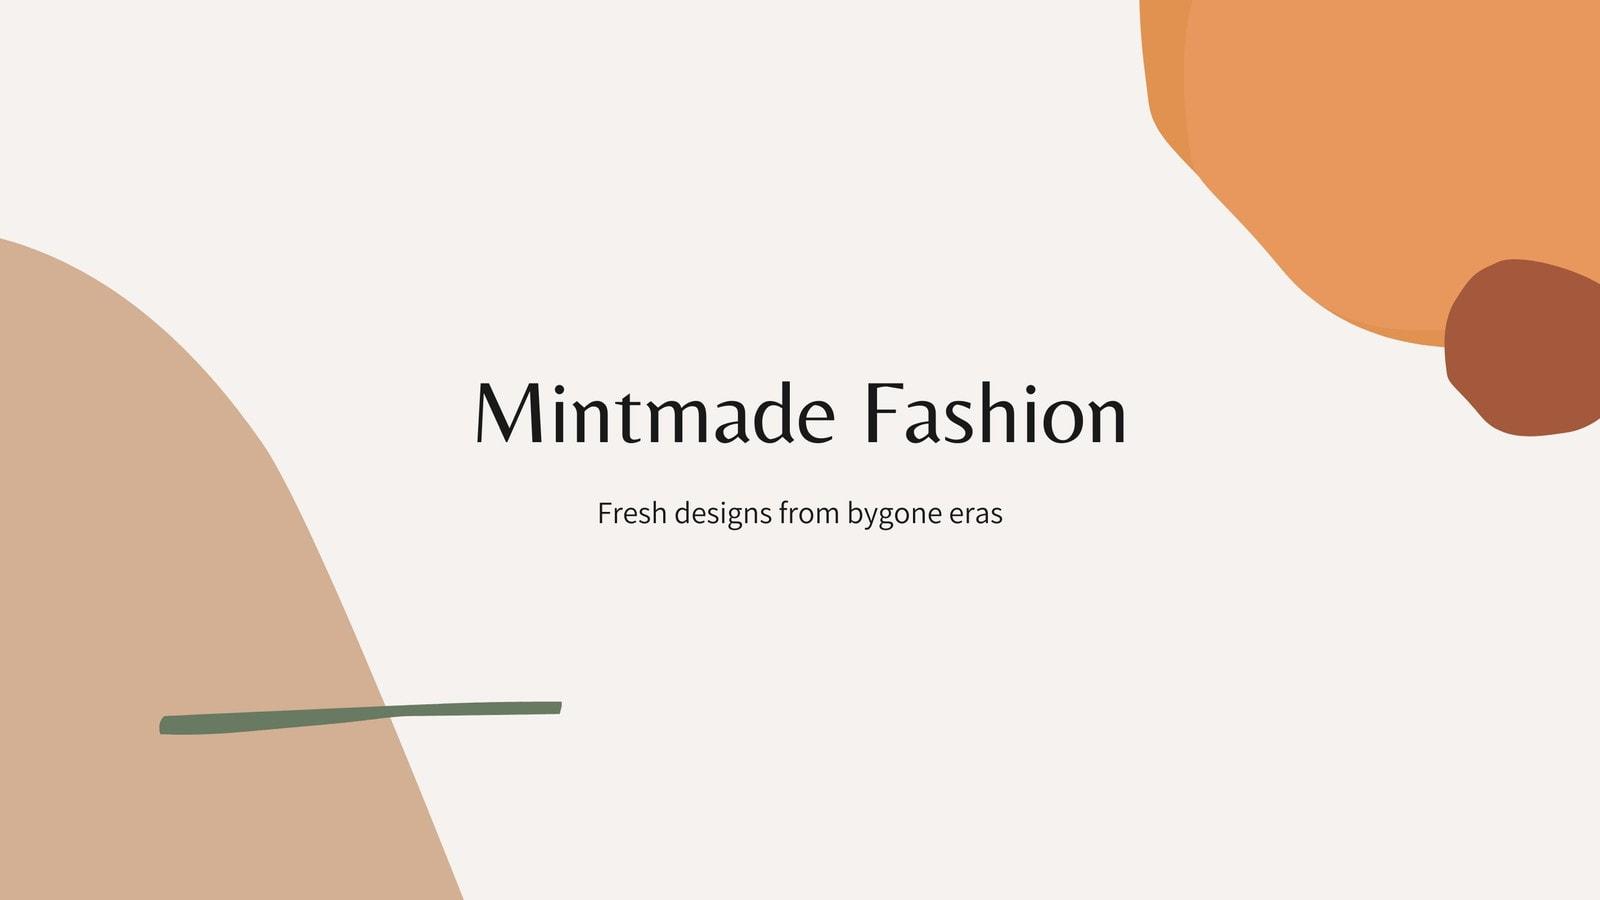 Brown and Orange Neutral Delicate Organic Fashion Marketing Video Presentation